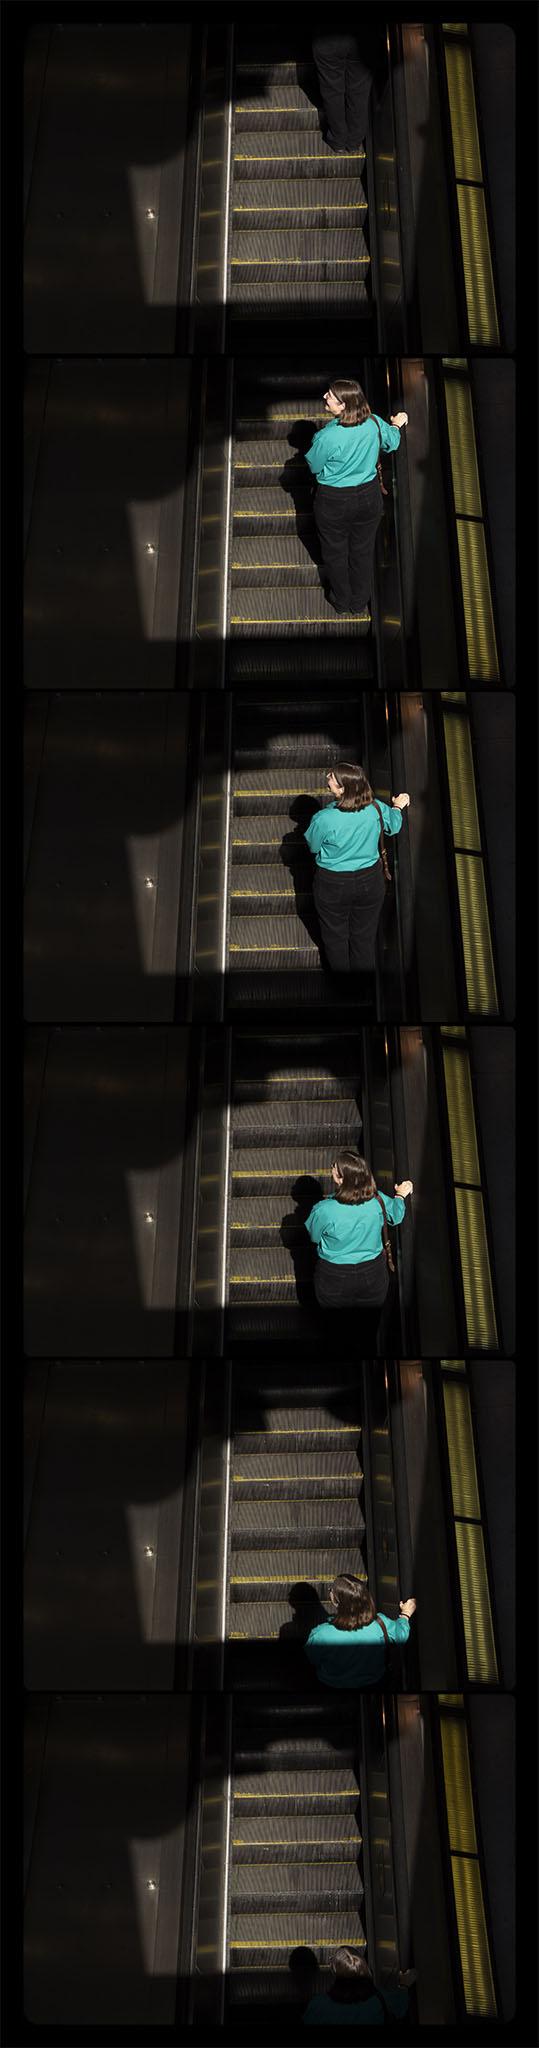 Metro Rail, Gallery Place-Chinatown, 4-21-2012-6739-6744